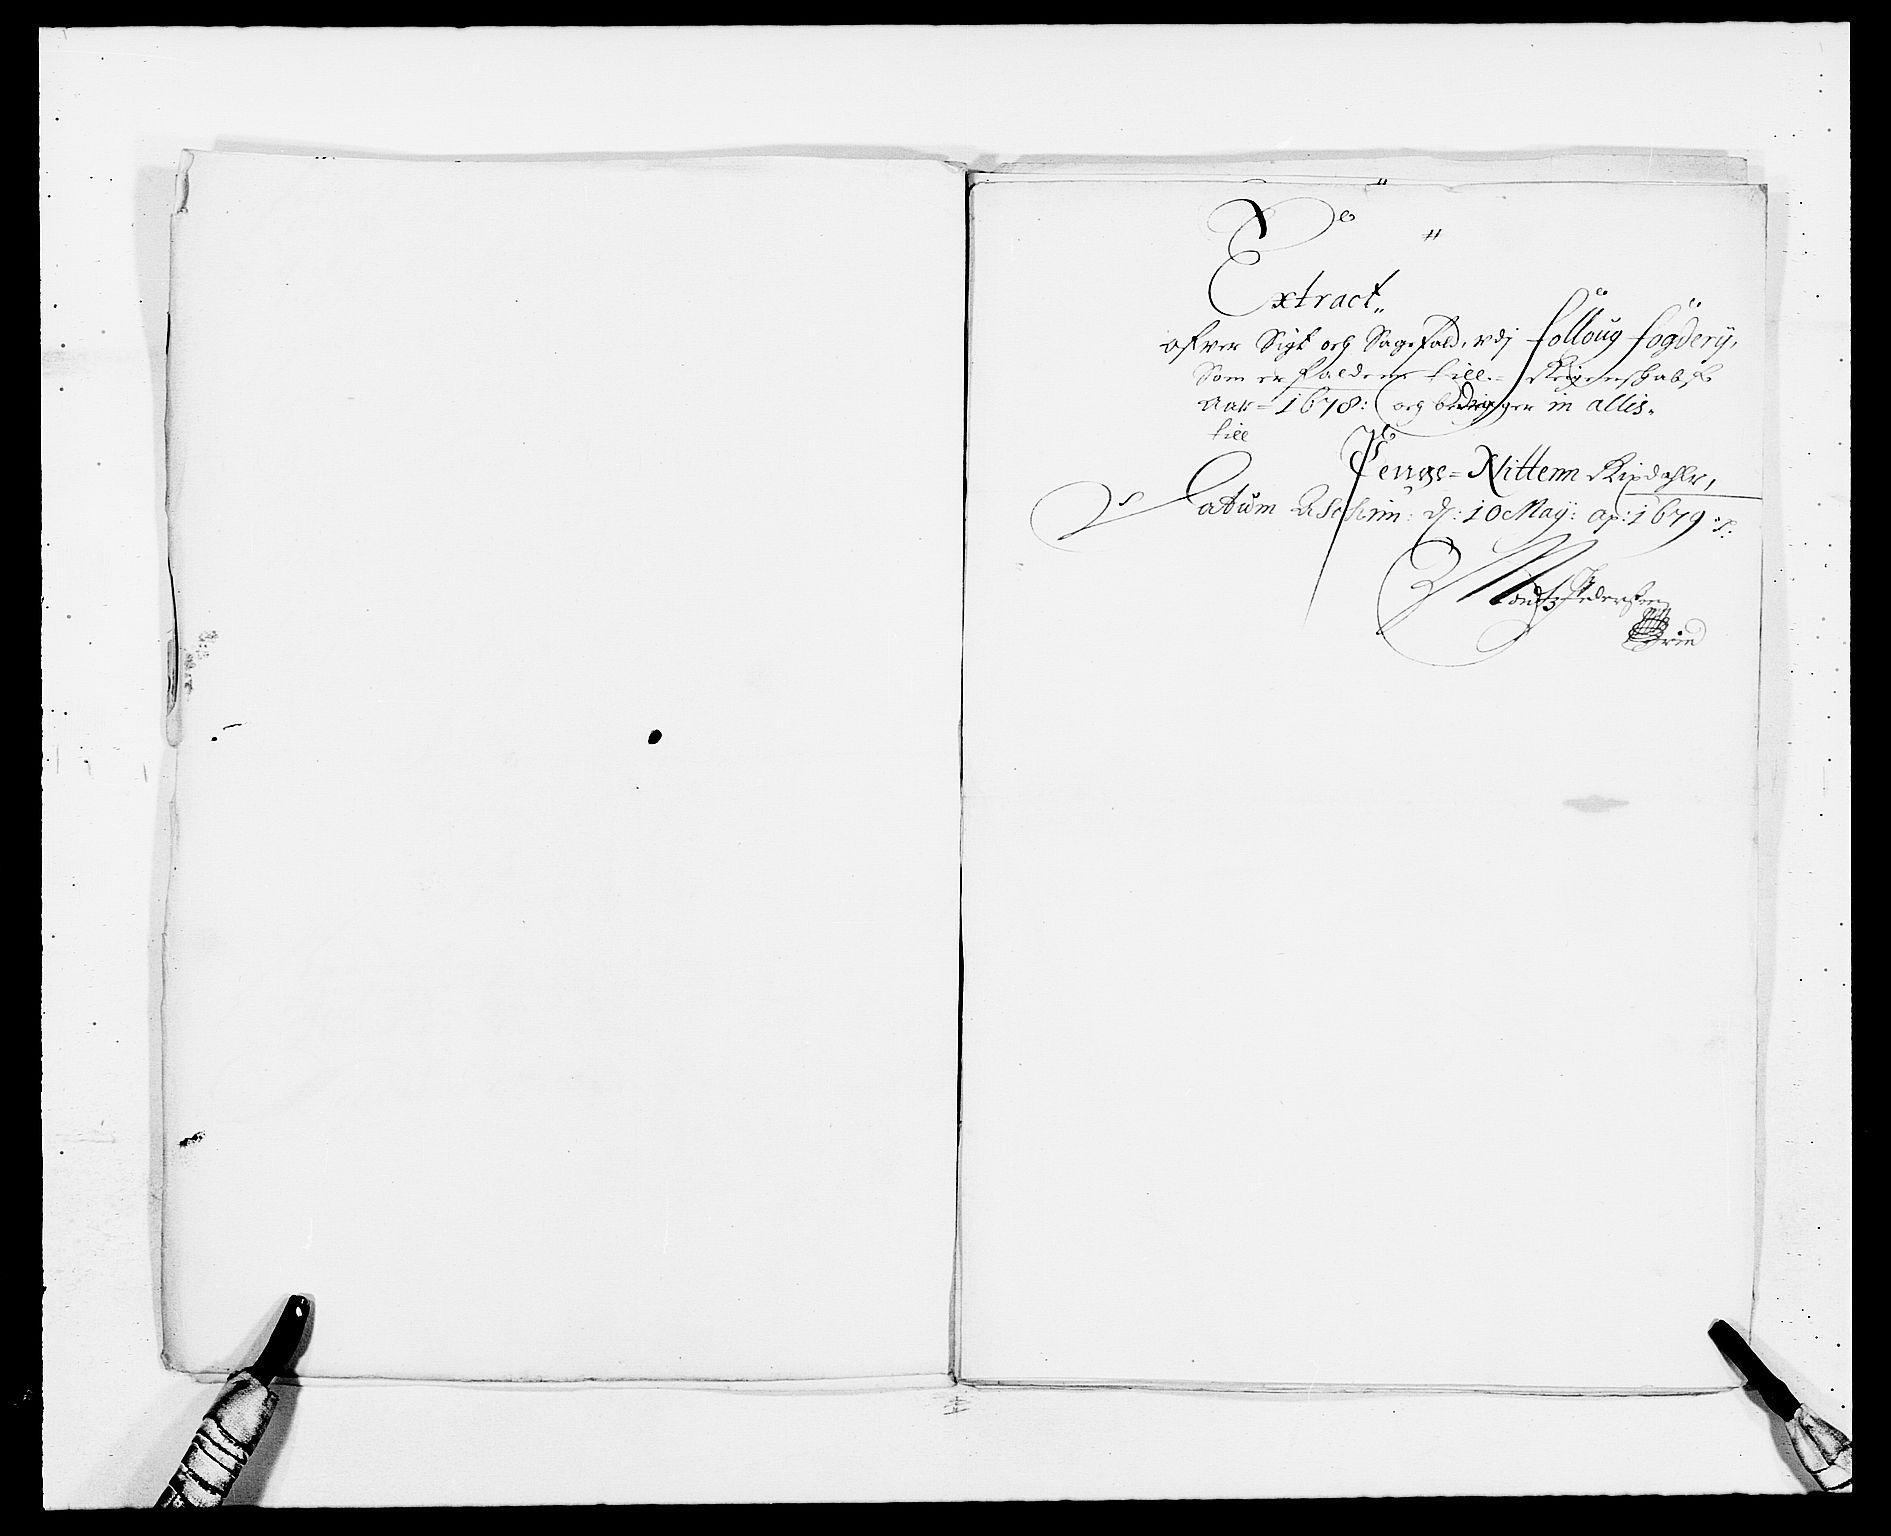 RA, Rentekammeret inntil 1814, Reviderte regnskaper, Fogderegnskap, R09/L0427: Fogderegnskap Follo, 1678, s. 251